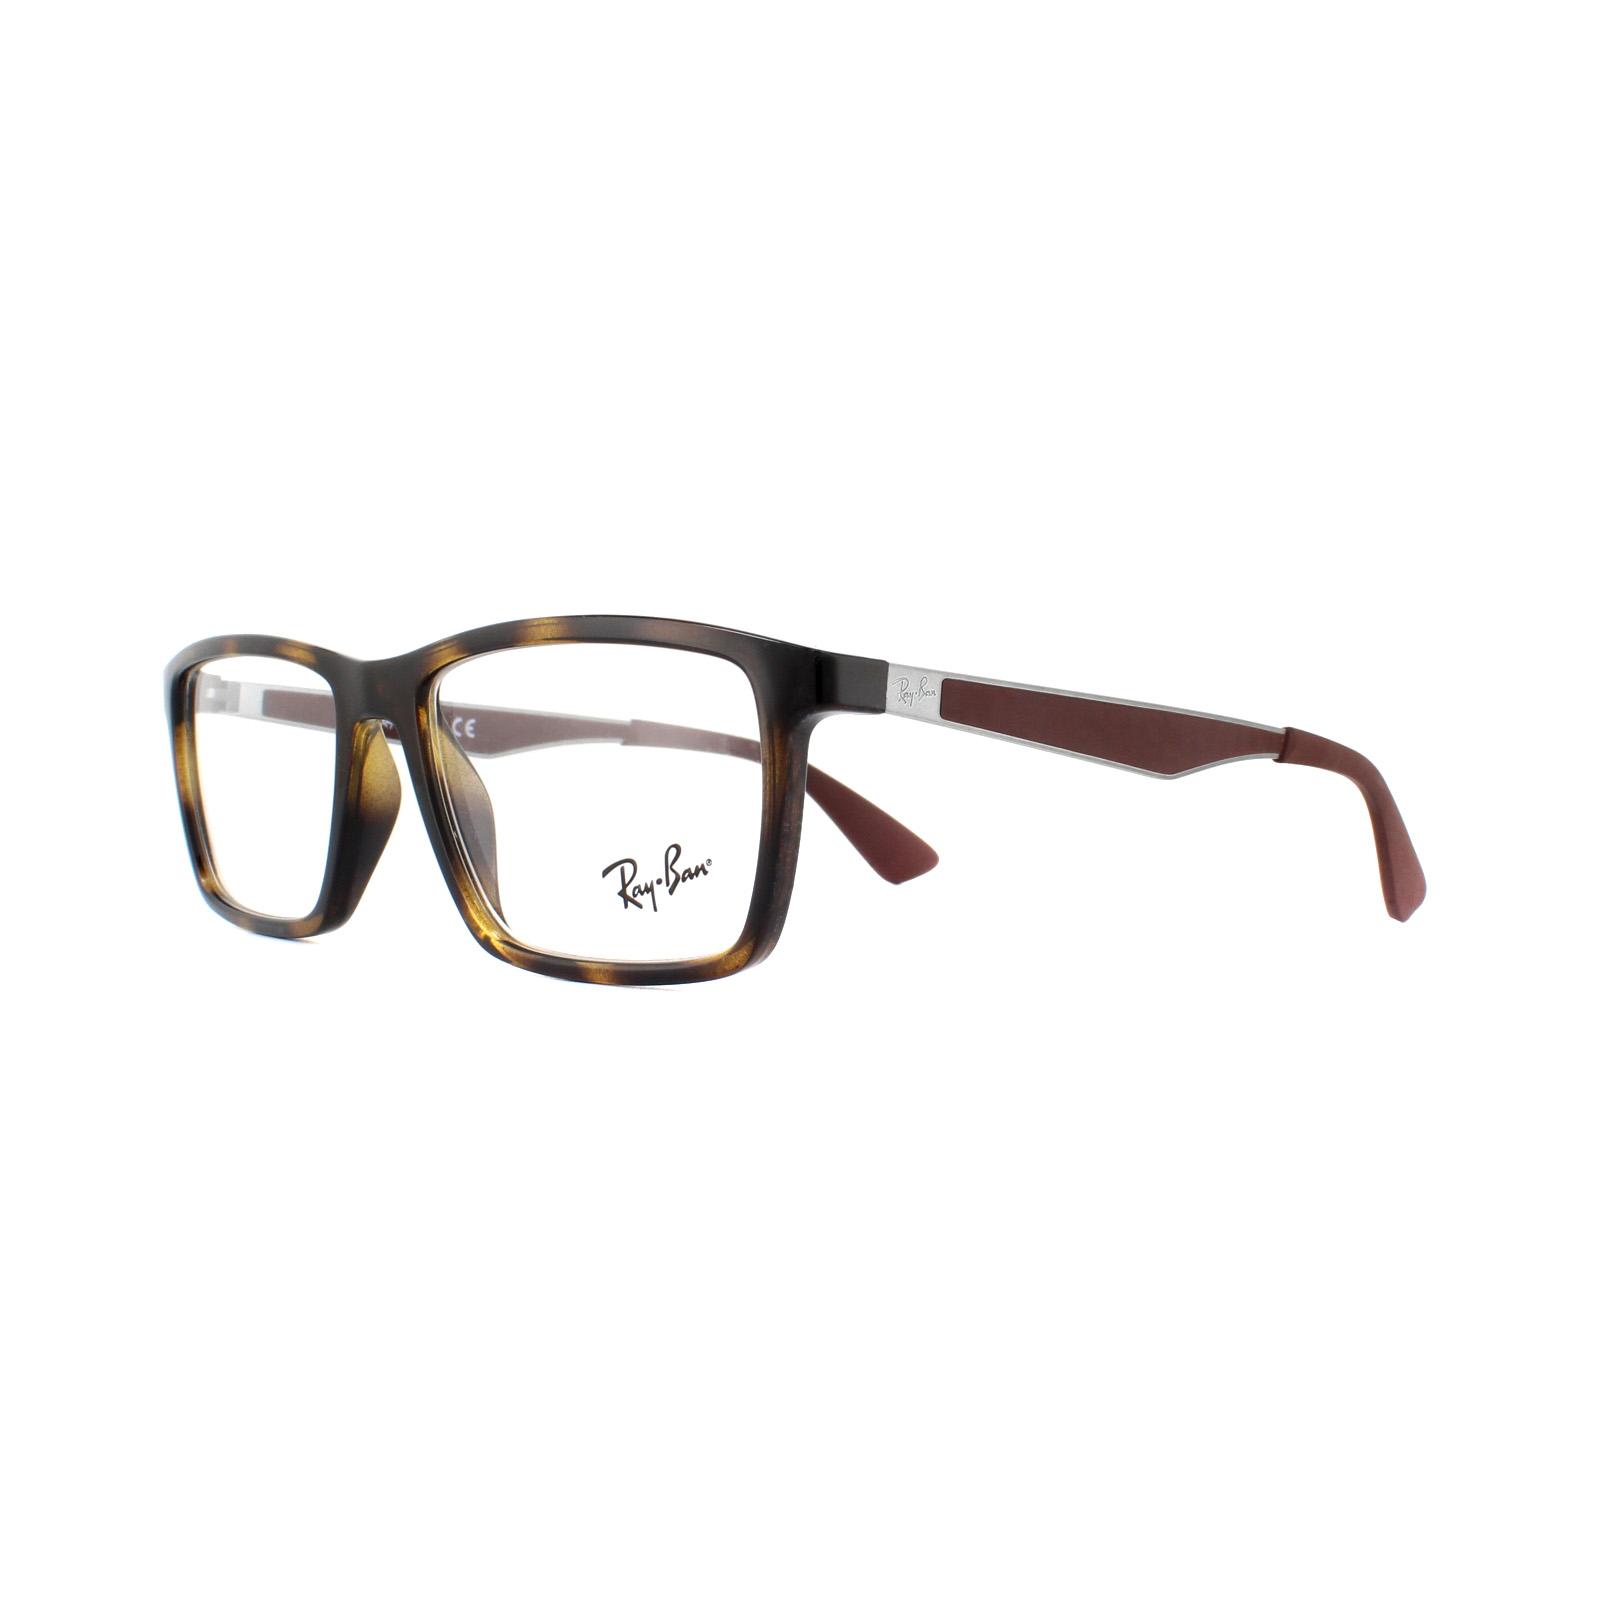 6f8d9380b2 Ray-Ban Glasses Frames 7056 2012 Shiny Havana 53mm 8053672403015